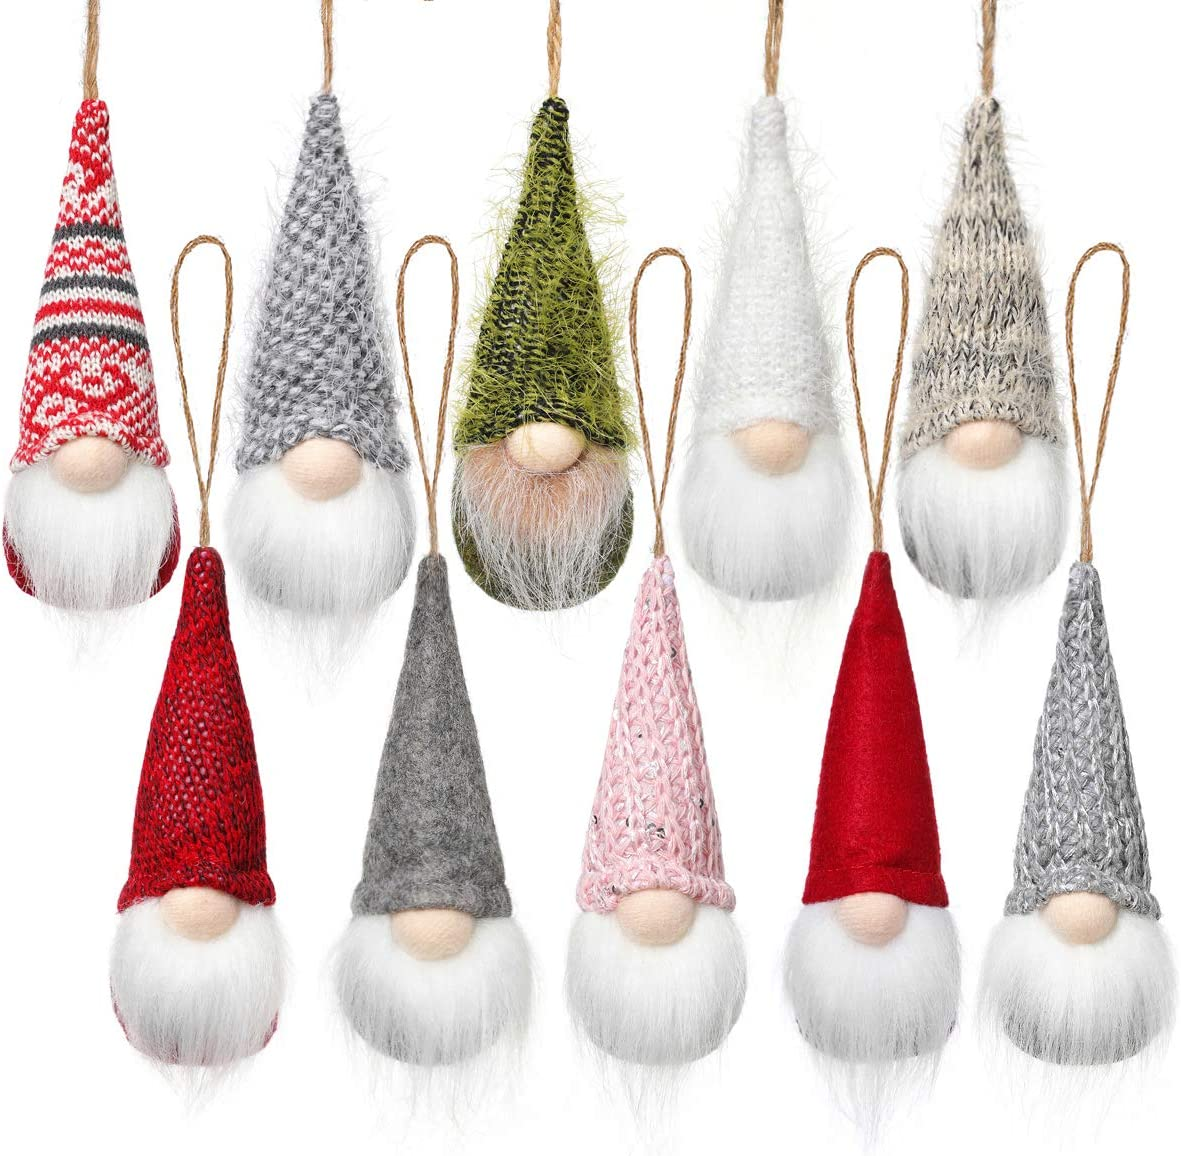 Christmas Tree Hanging Gnomes Ornaments Set Of 10 Swedish Handmade Plush Gnomes Santa Elf Hanging Home Decorations Holiday Decor Amazon Ca Home Kitchen